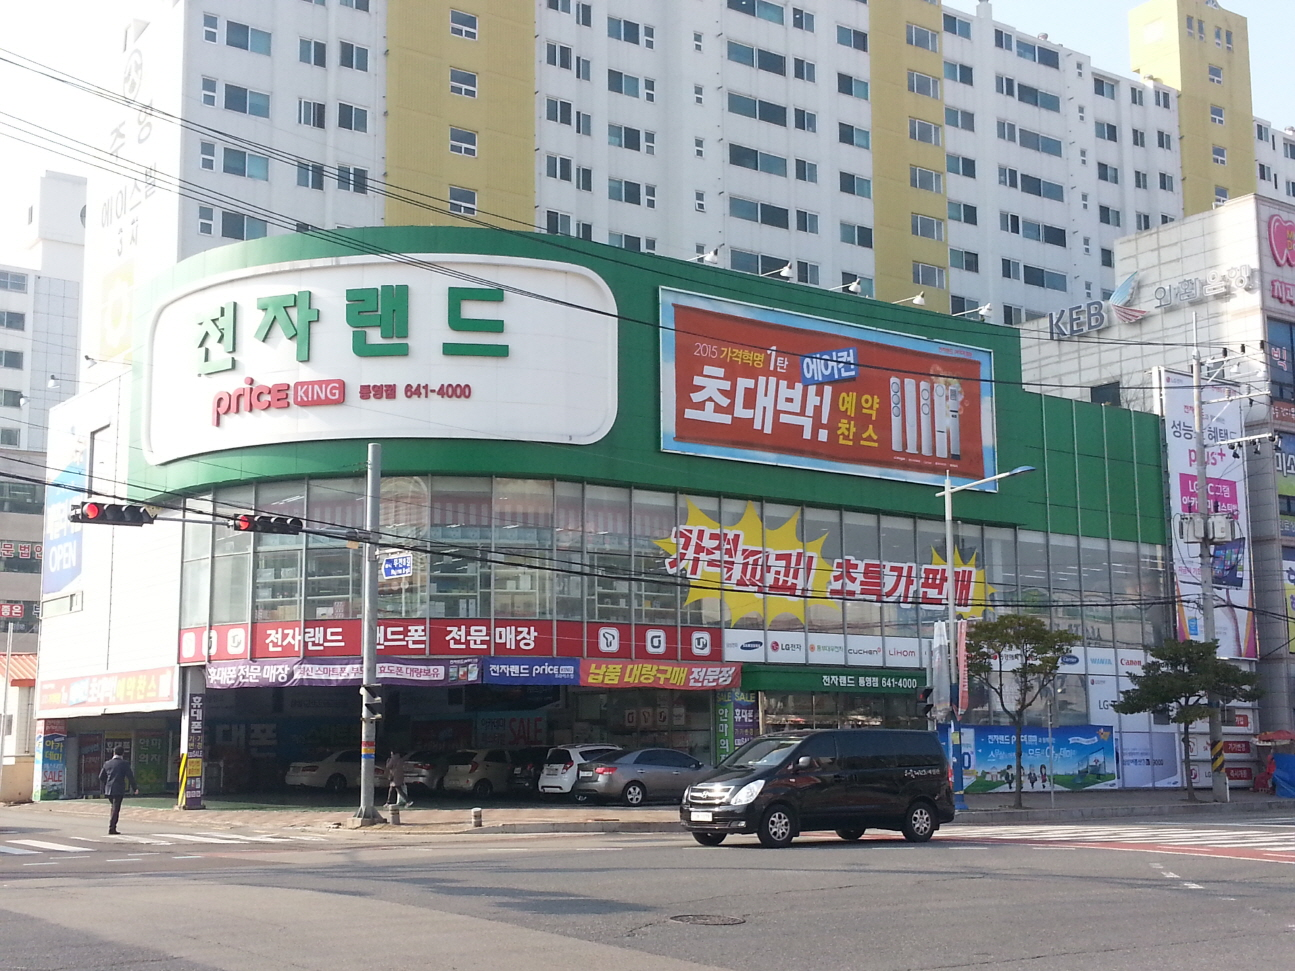 ET Land Price King – Tongyeong Branch (전자랜드 프라이스킹 (통영점))